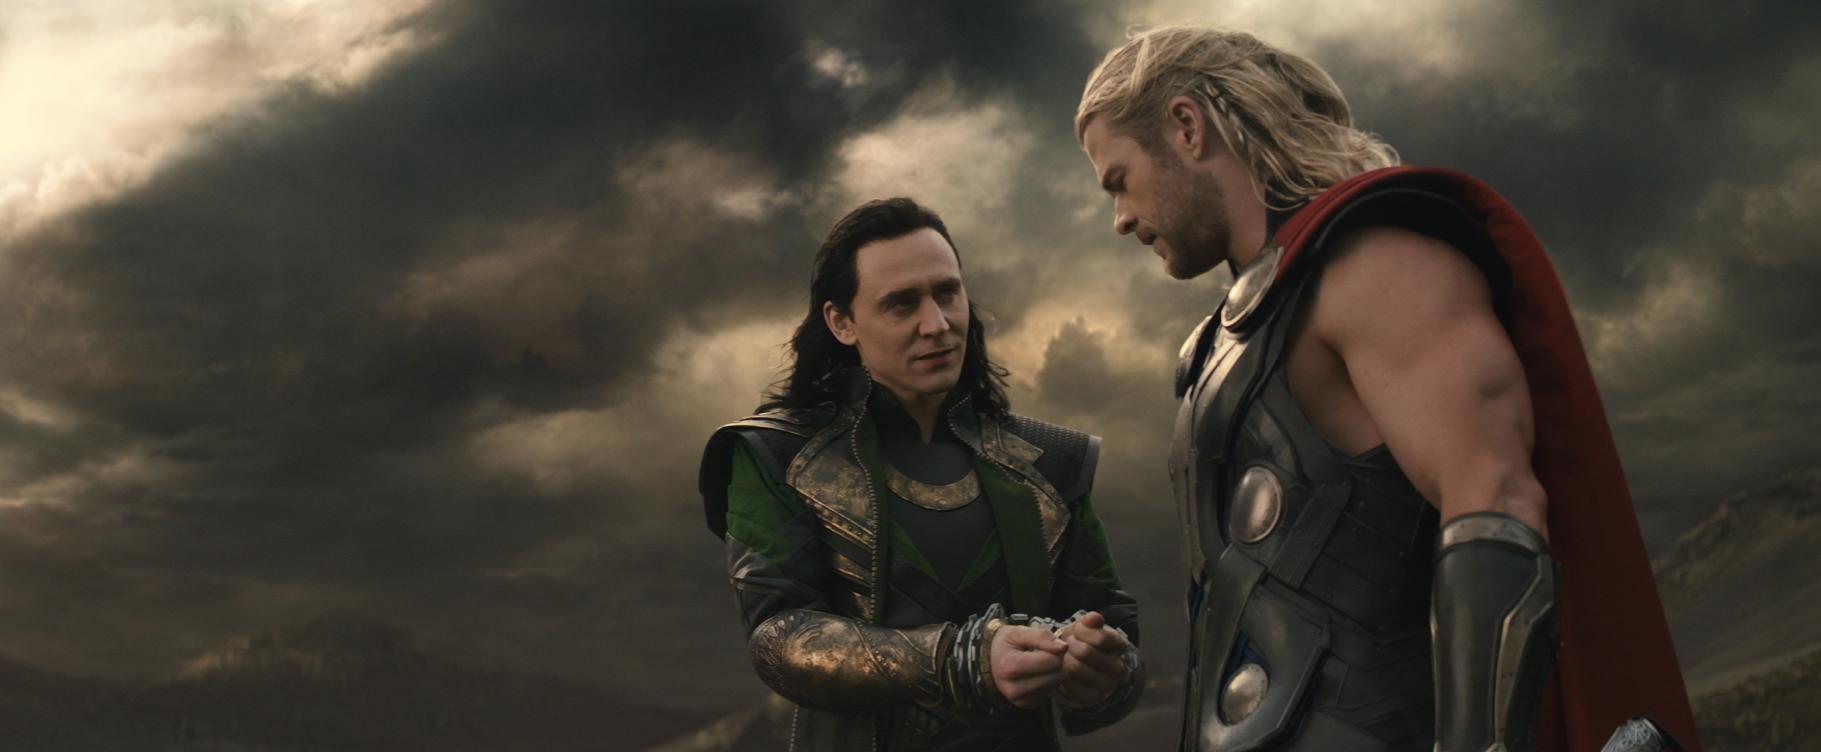 Thor-The-Dark-World_11